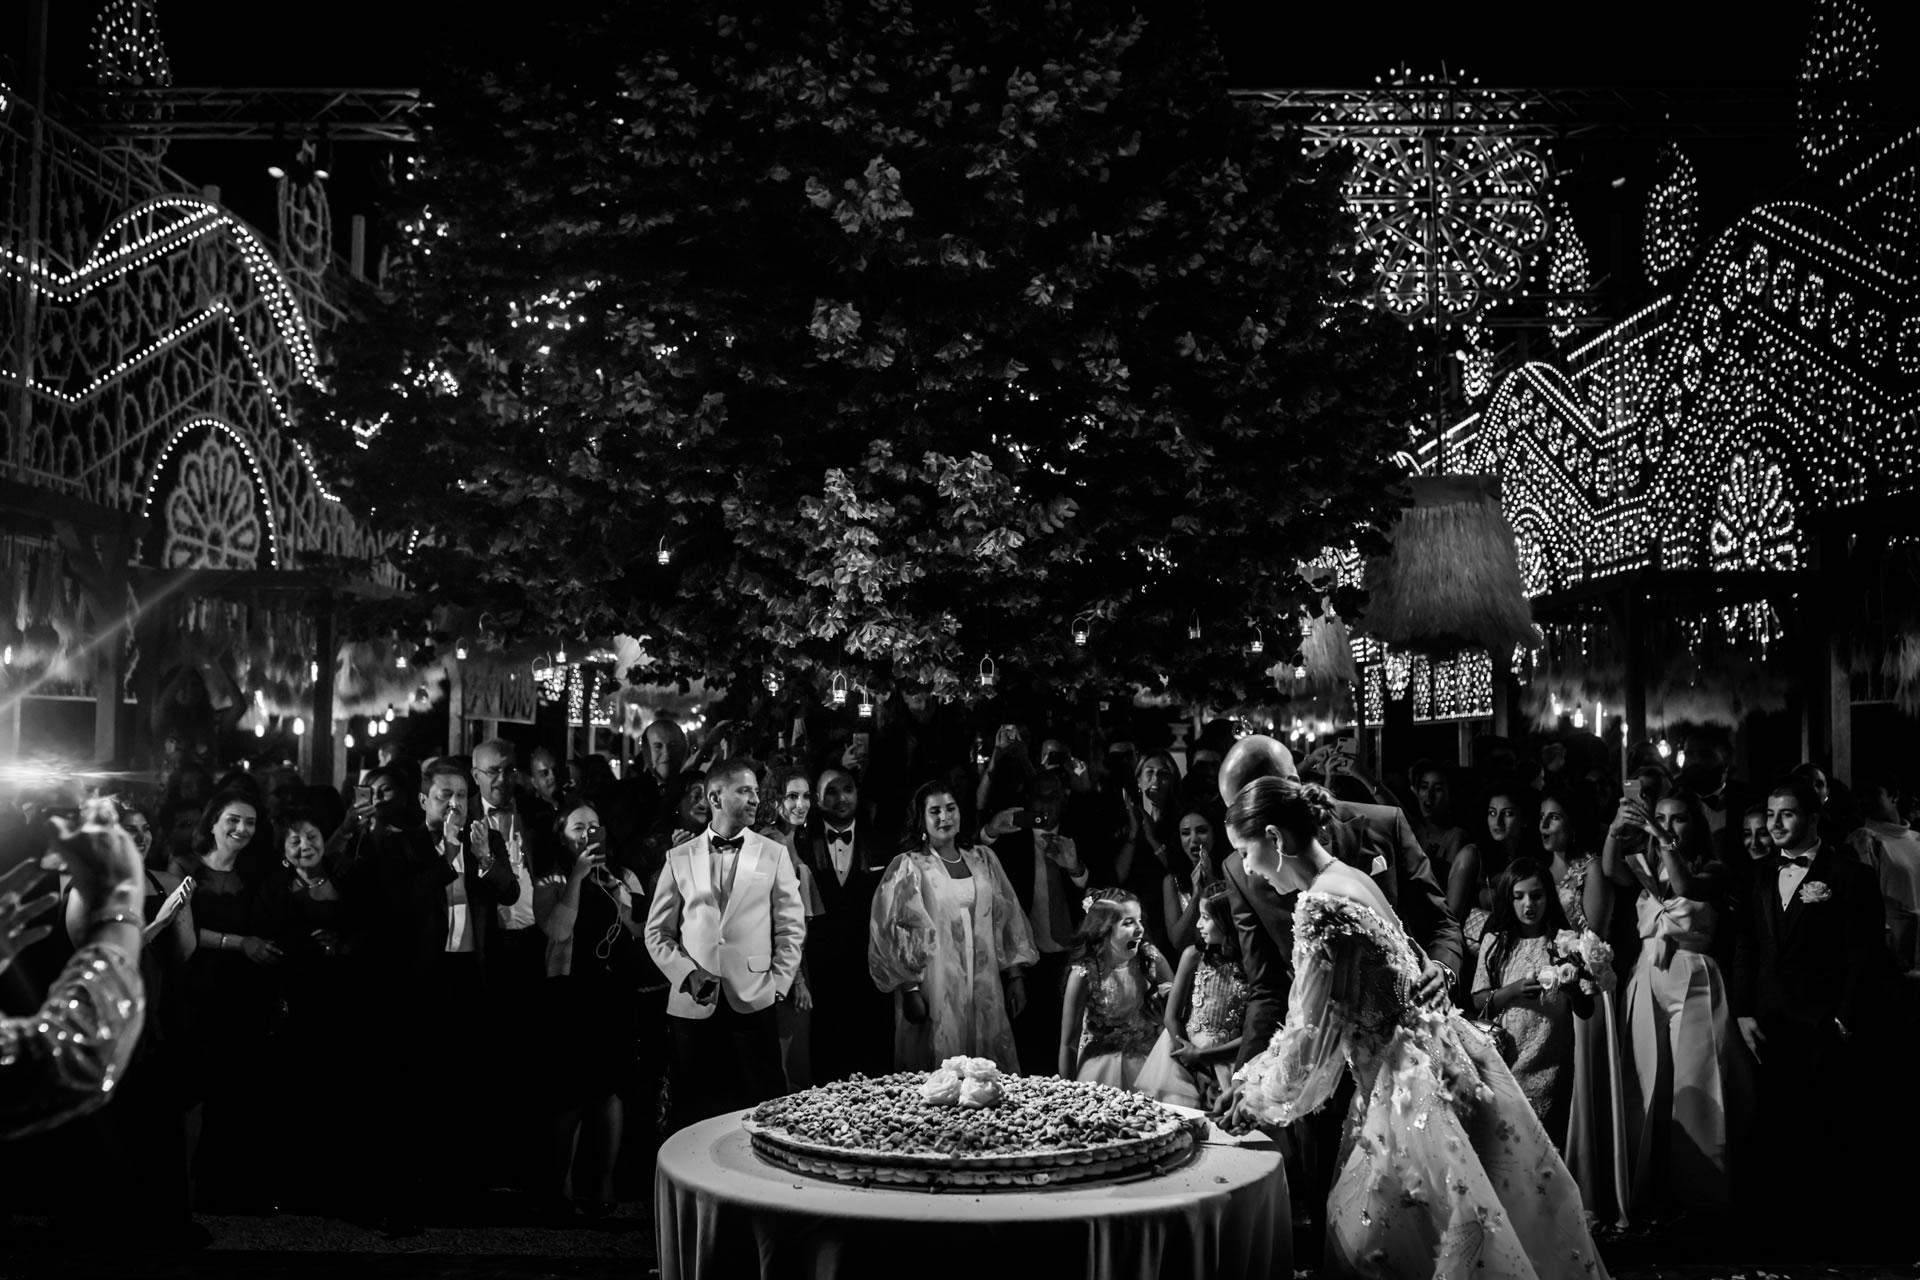 Cake Cut - 67 :: Luxury wedding at Il Borro :: Luxury wedding photography - 66 :: Cake Cut - 67